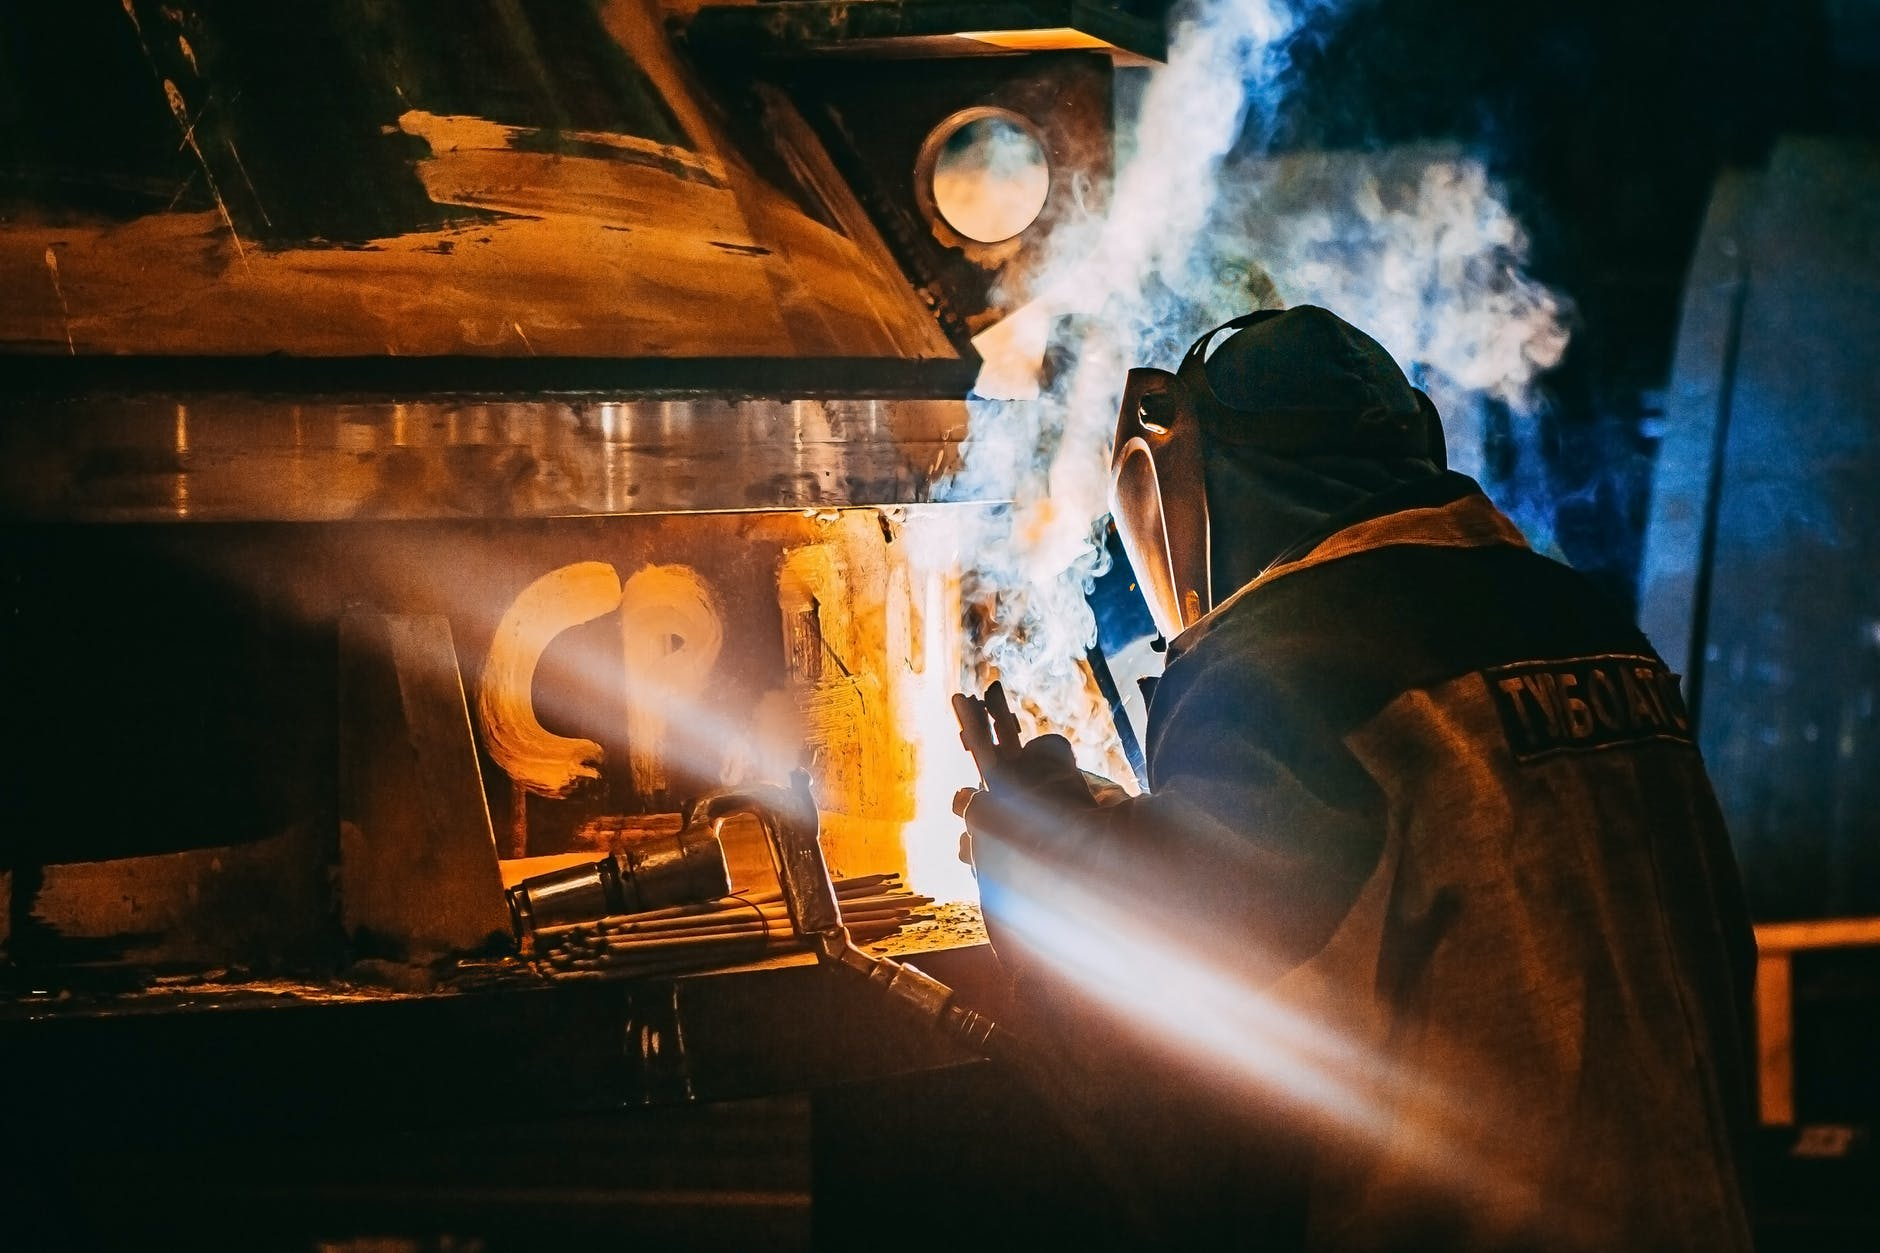 person wearing gray jacket and welding helmet